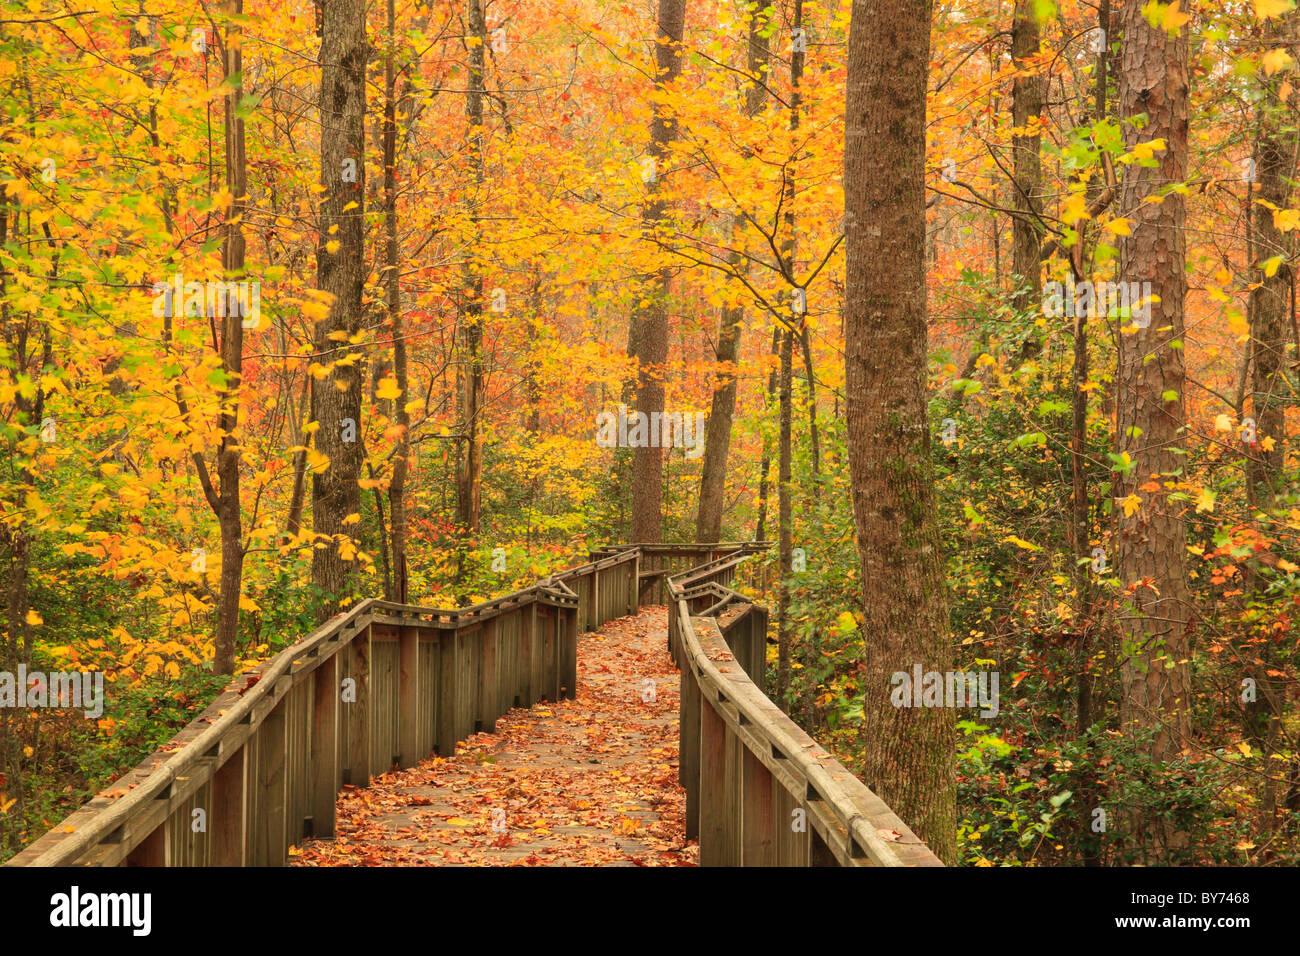 Talmadge Butler Boardwalk Trail, Azalea Cascade Trail, DeSoto State Park, Fort Payne, Alabama, USA - Stock Image